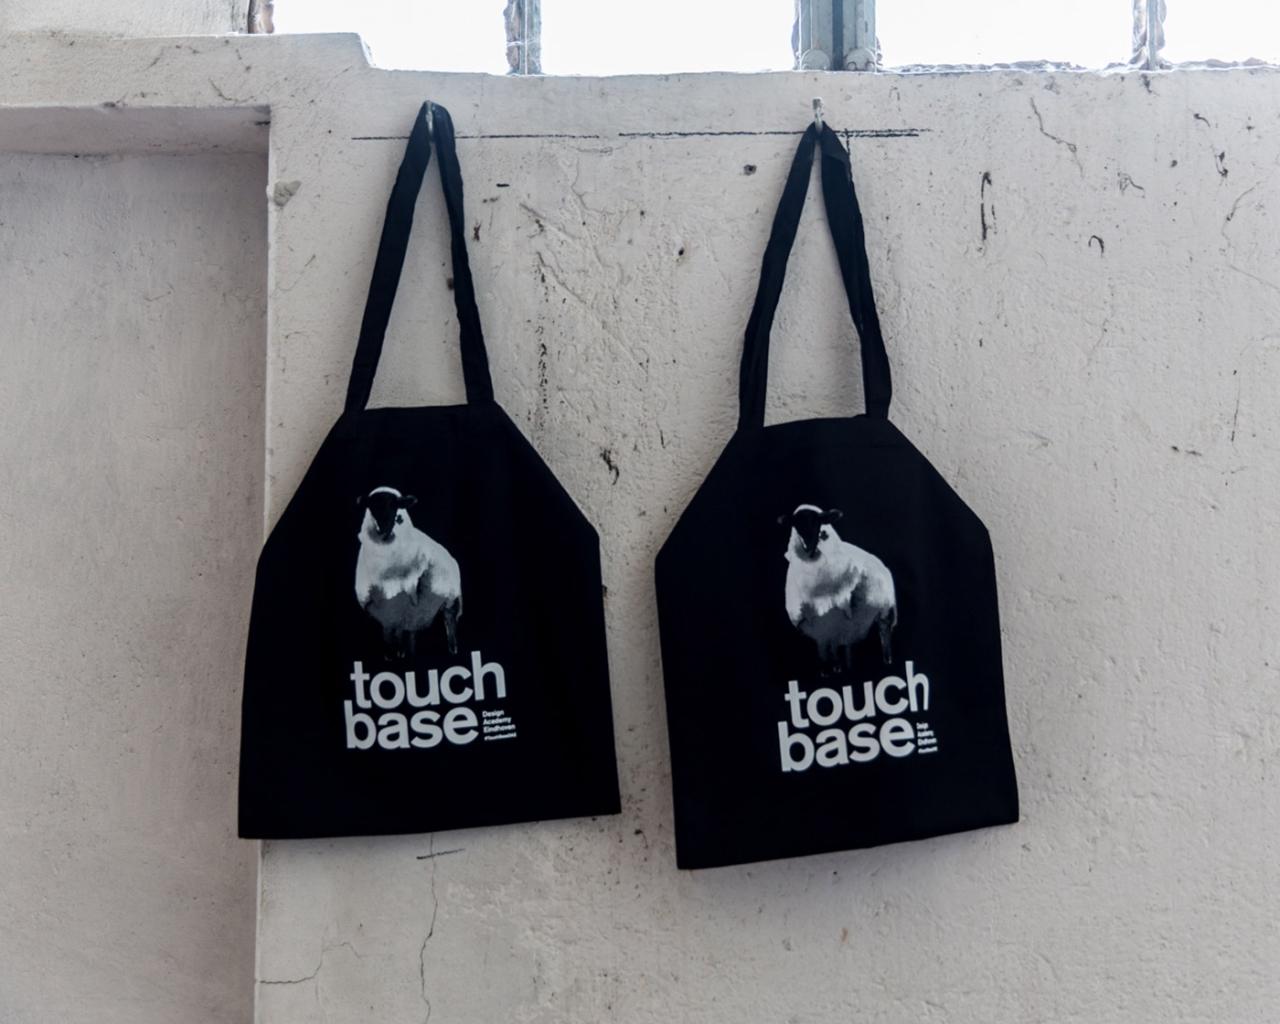 dae touch base salone milan 2016 (14)